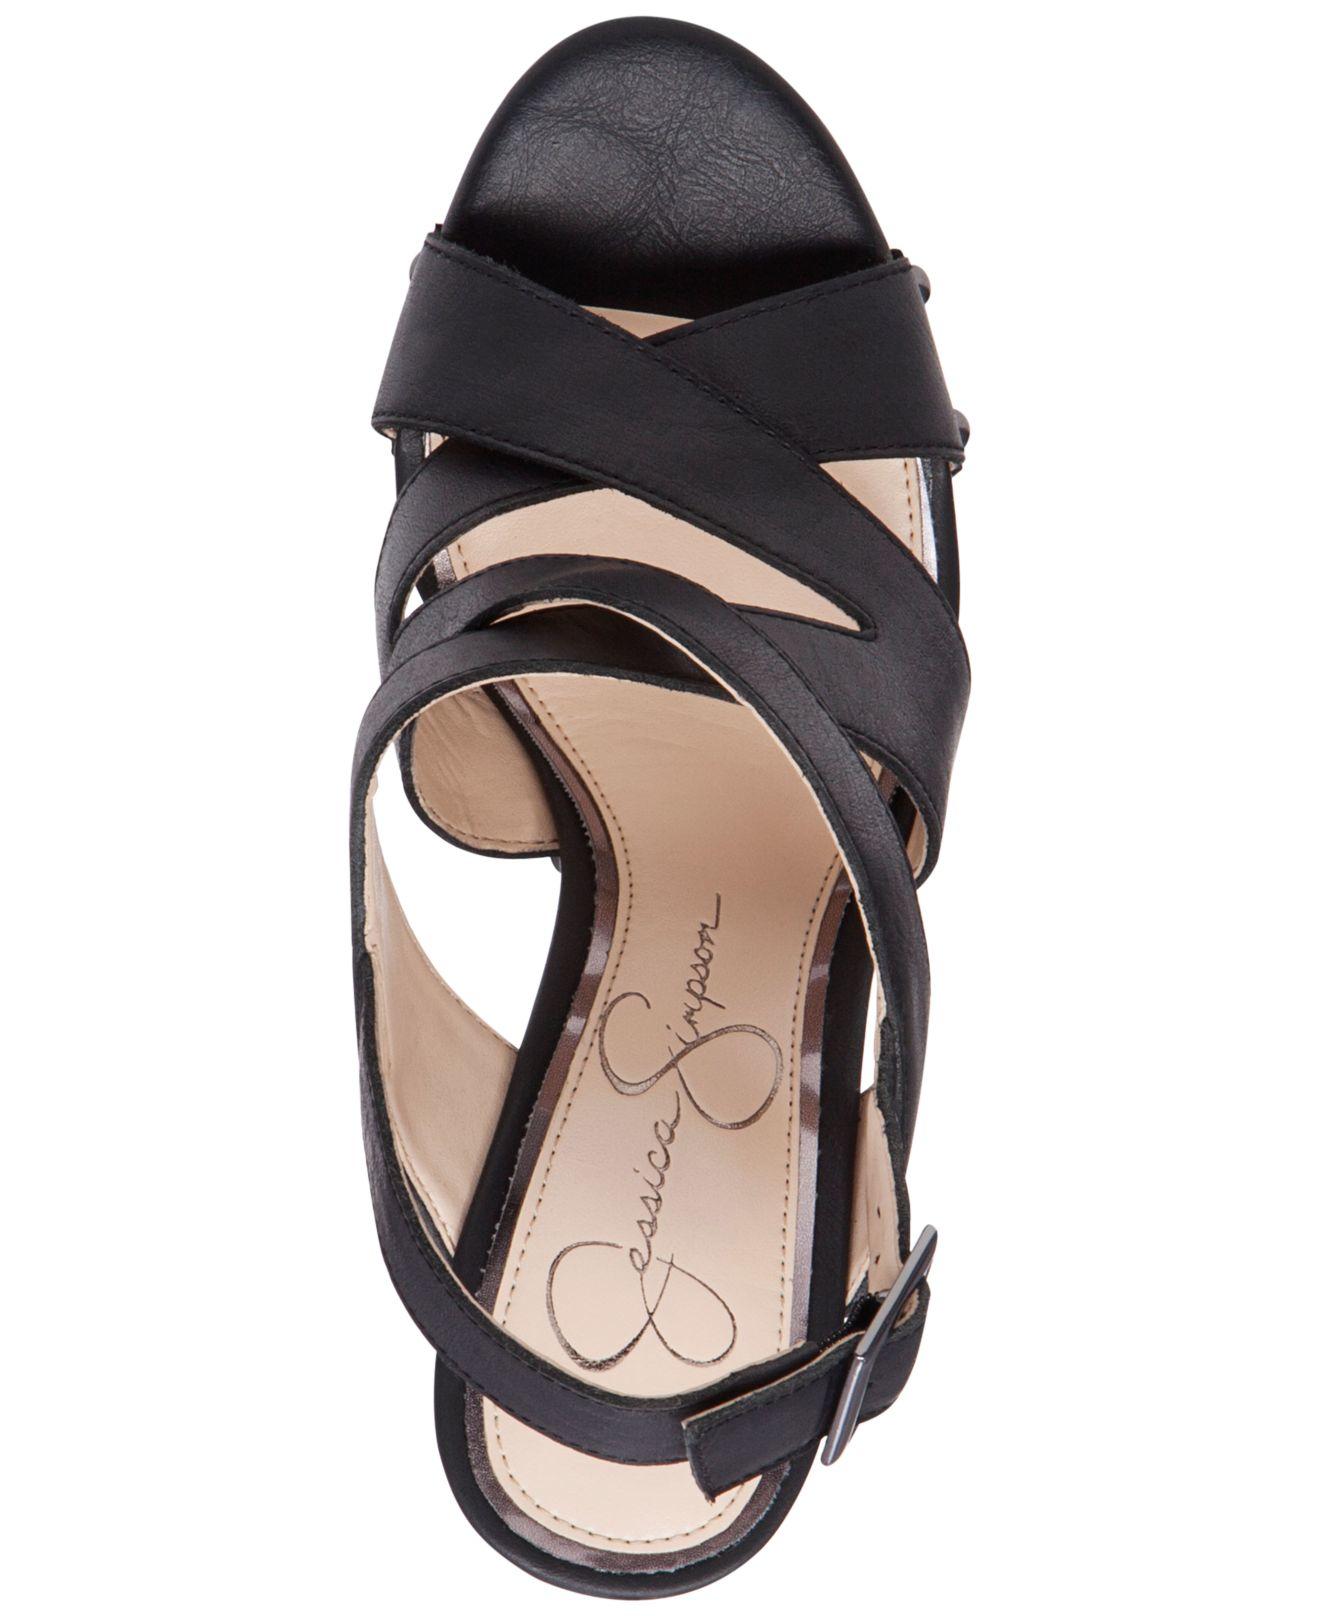 Jessica Simpson Damelo Strappy Wood Heel Platform Sandals